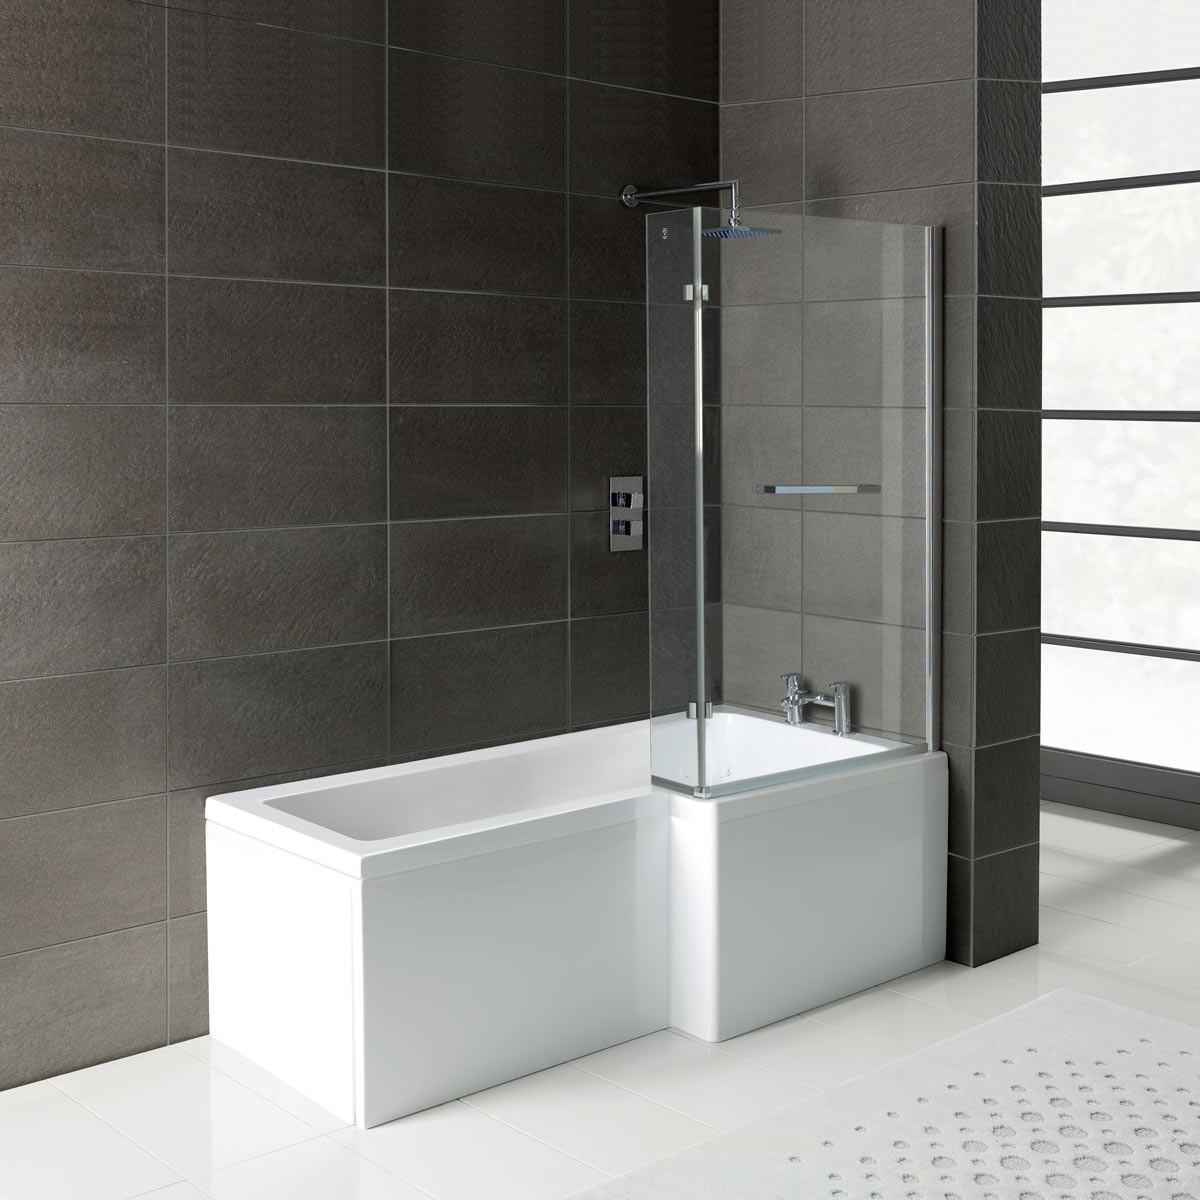 L shaped bath leda l shape shower bath 1700 x 850 with panel u0026 screen right GZMIJKB